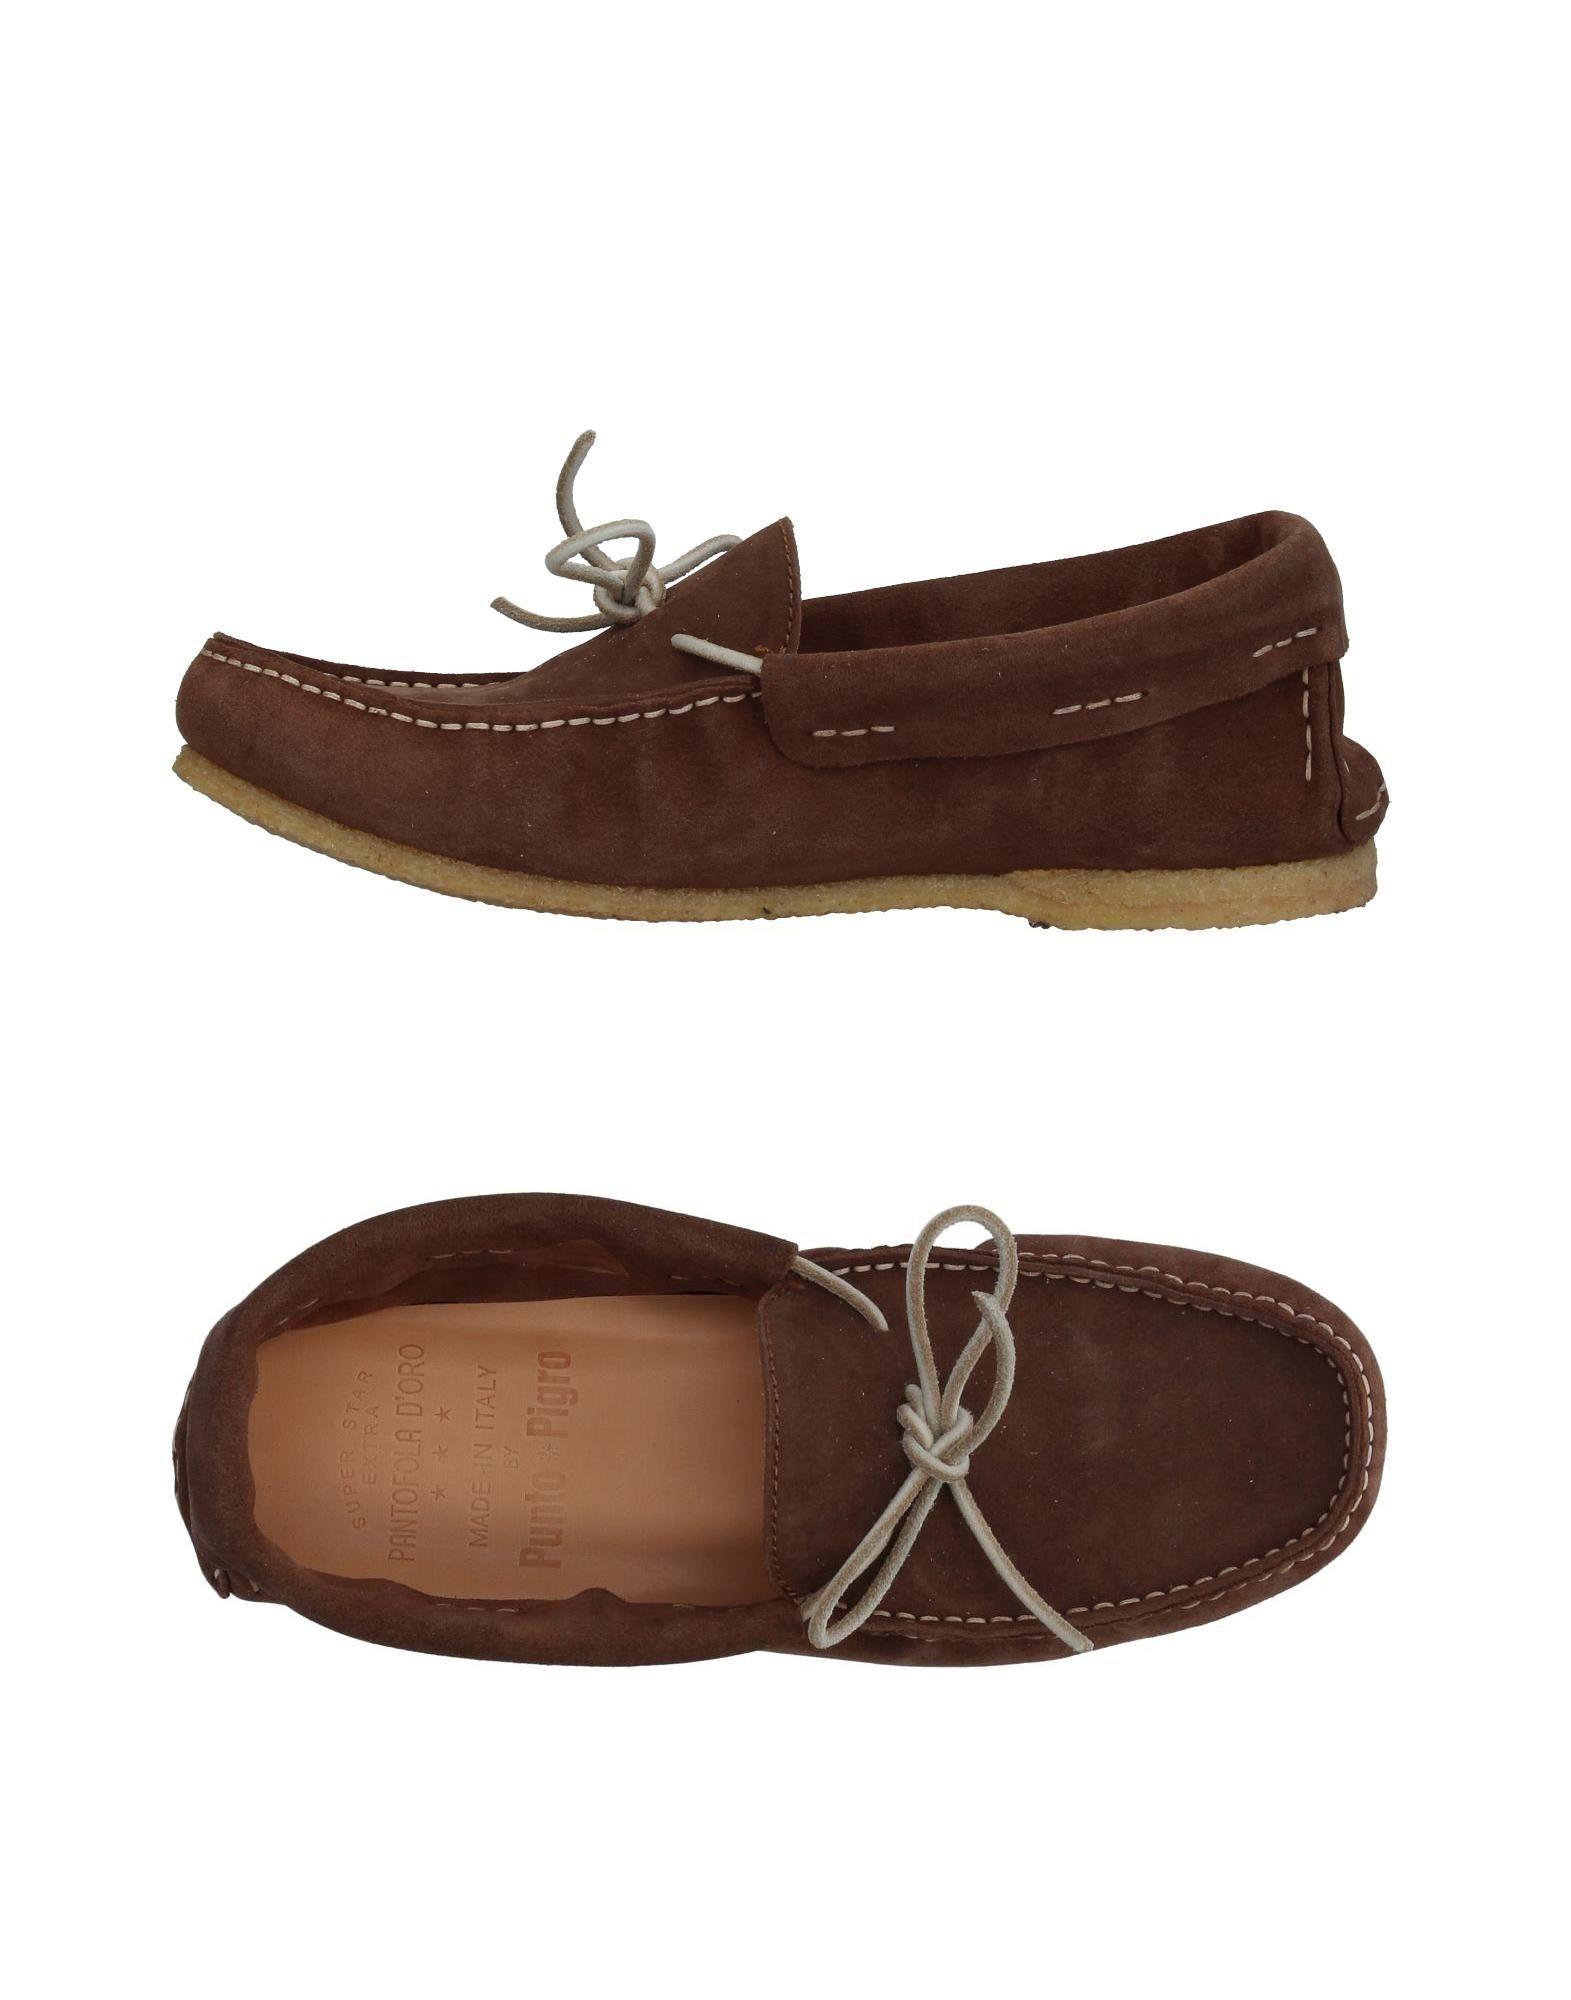 Mocassino 11353845VB Pantofola D'oro Uomo - 11353845VB Mocassino 148611